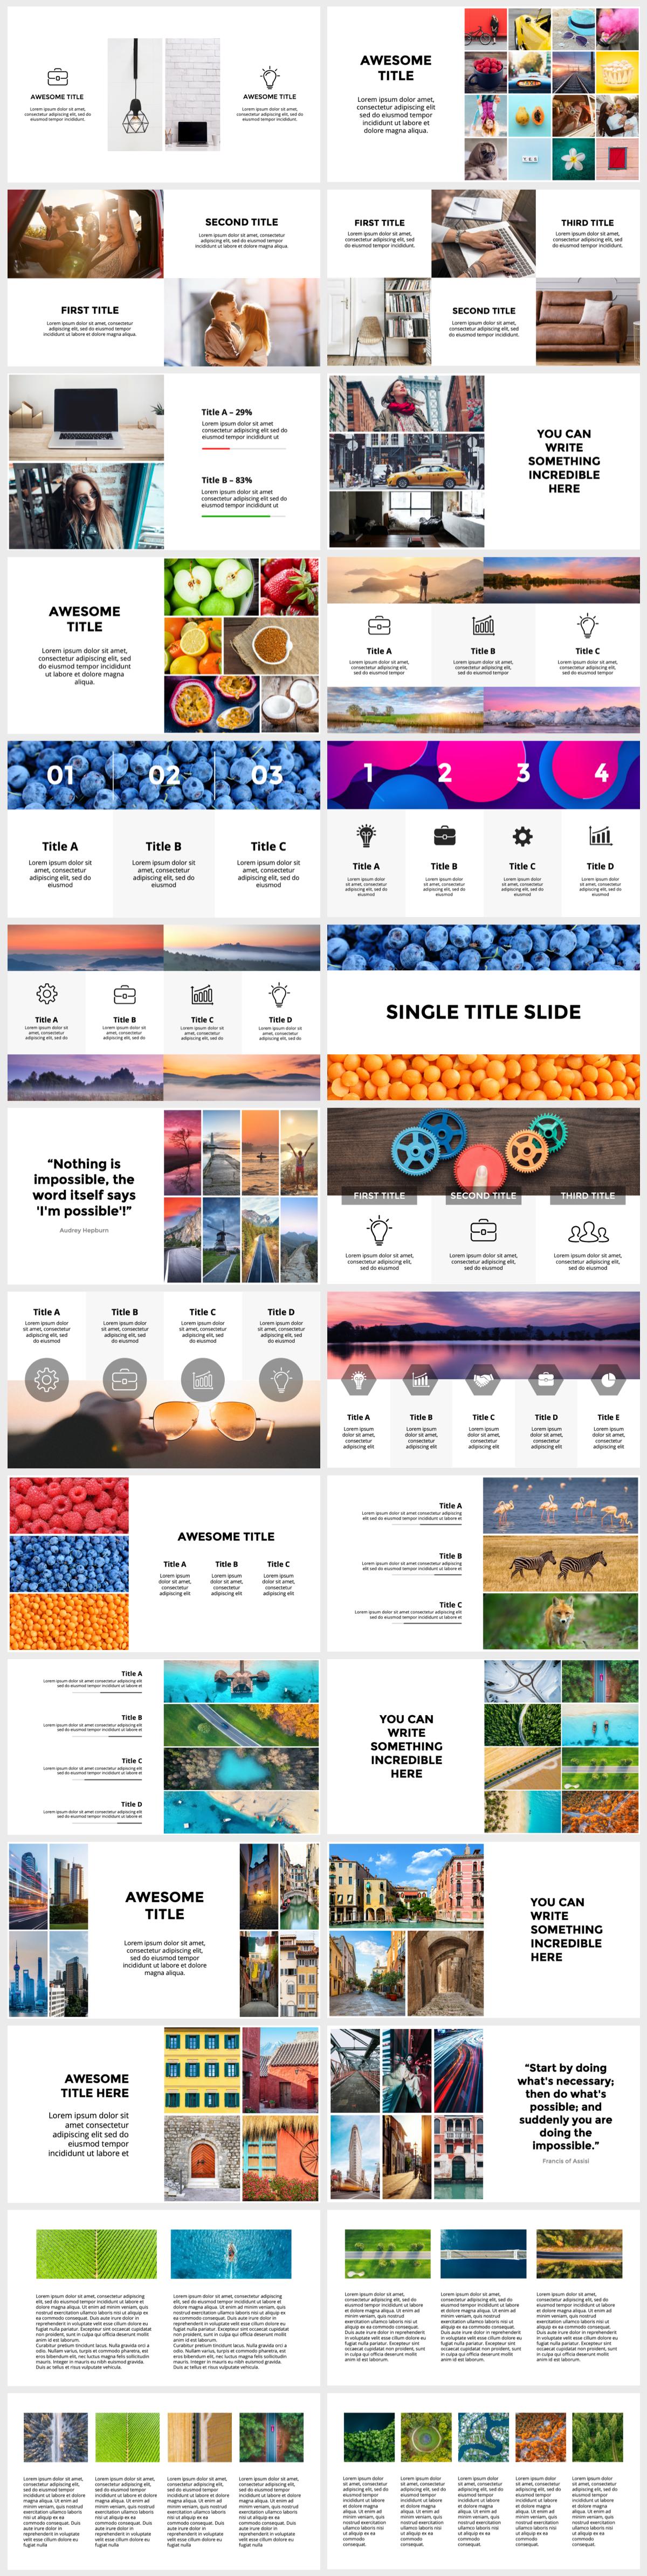 Huge Infographics Bundle! Lifetime Updates! PowerPoint, Photoshop, Illustrator. - 128